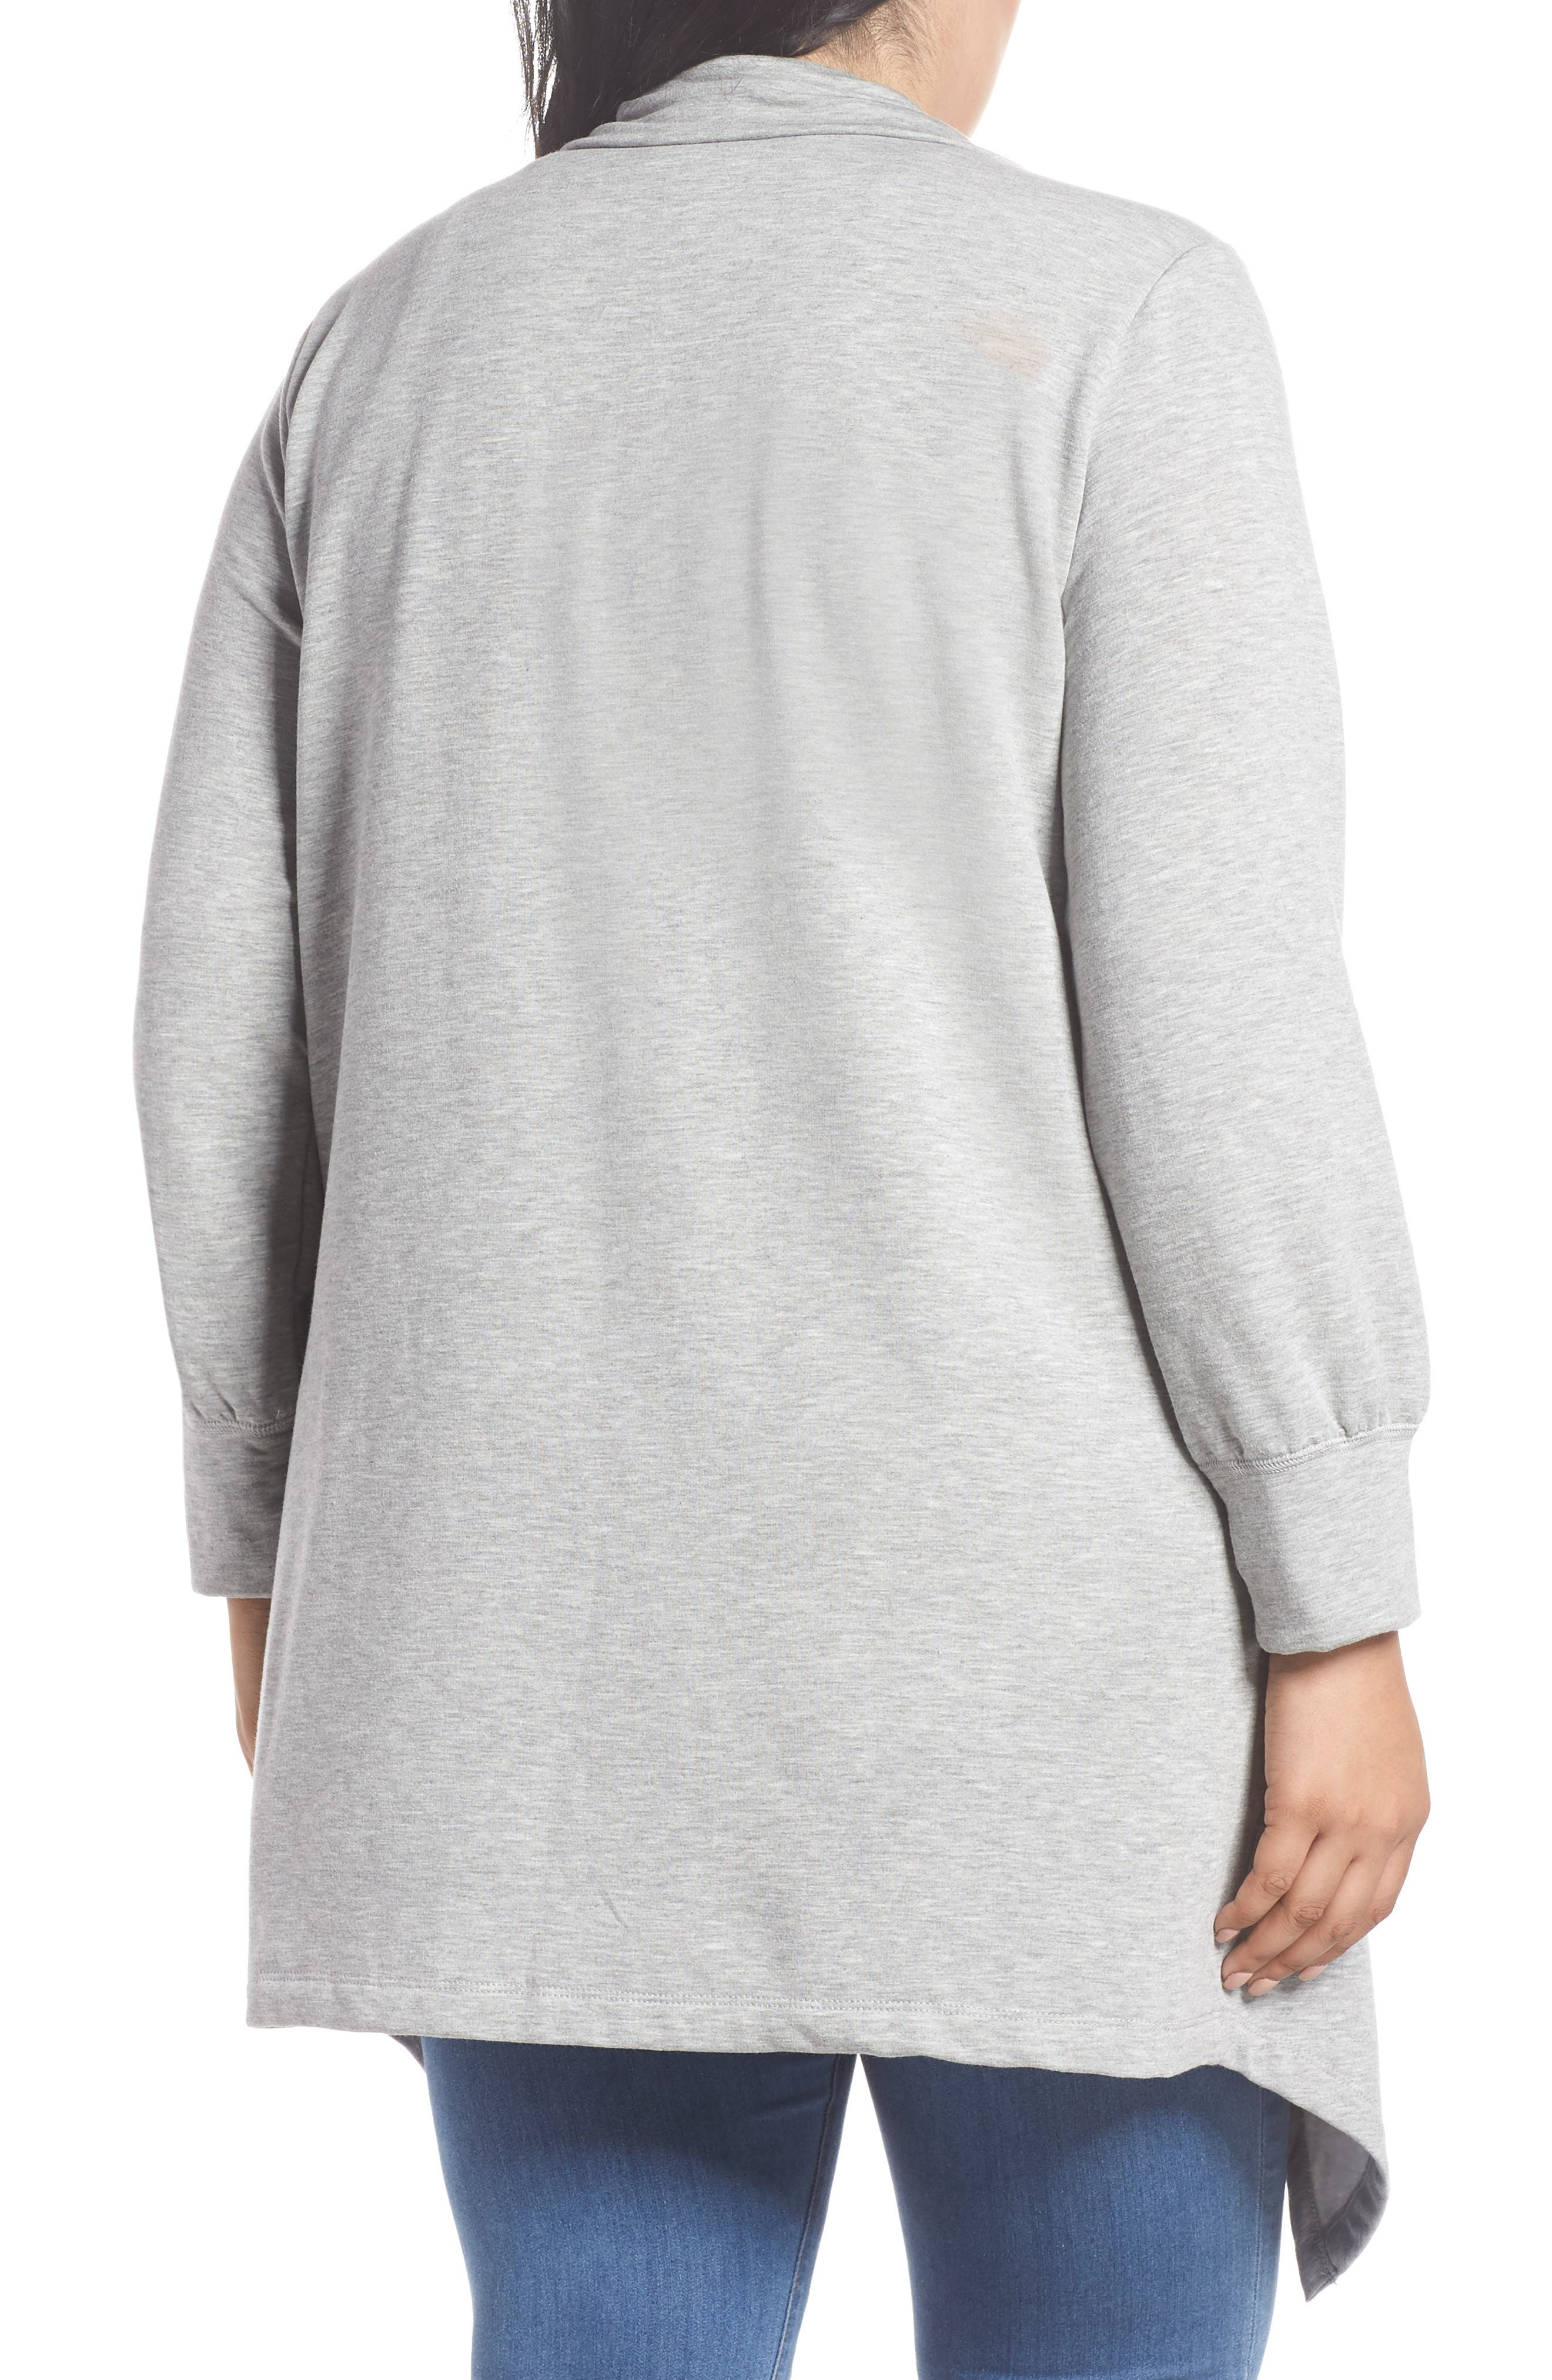 Off-Duty Fleece Knit Cardigan,                             Alternate thumbnail 2, color,                             Grey Heather